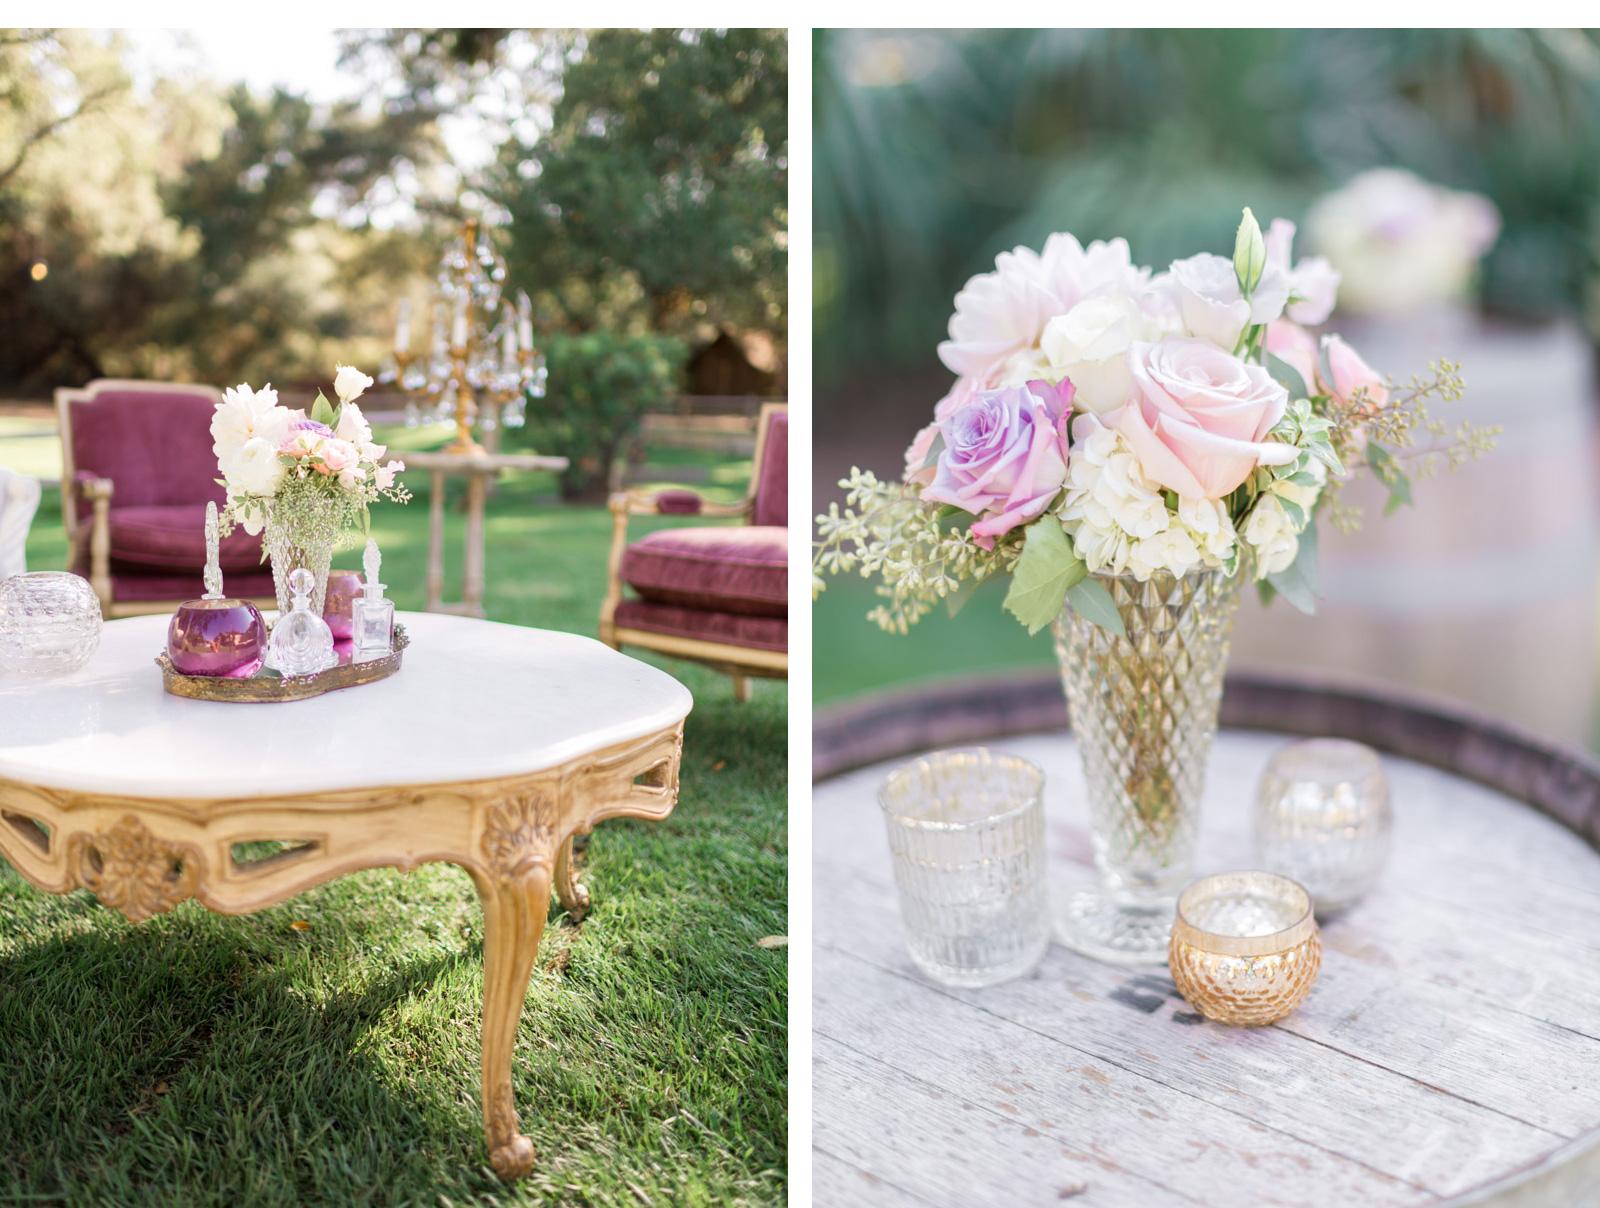 Nia-Sanchez-Southern-California-Wedding-Natalie-Schutt-Photography_07.jpg